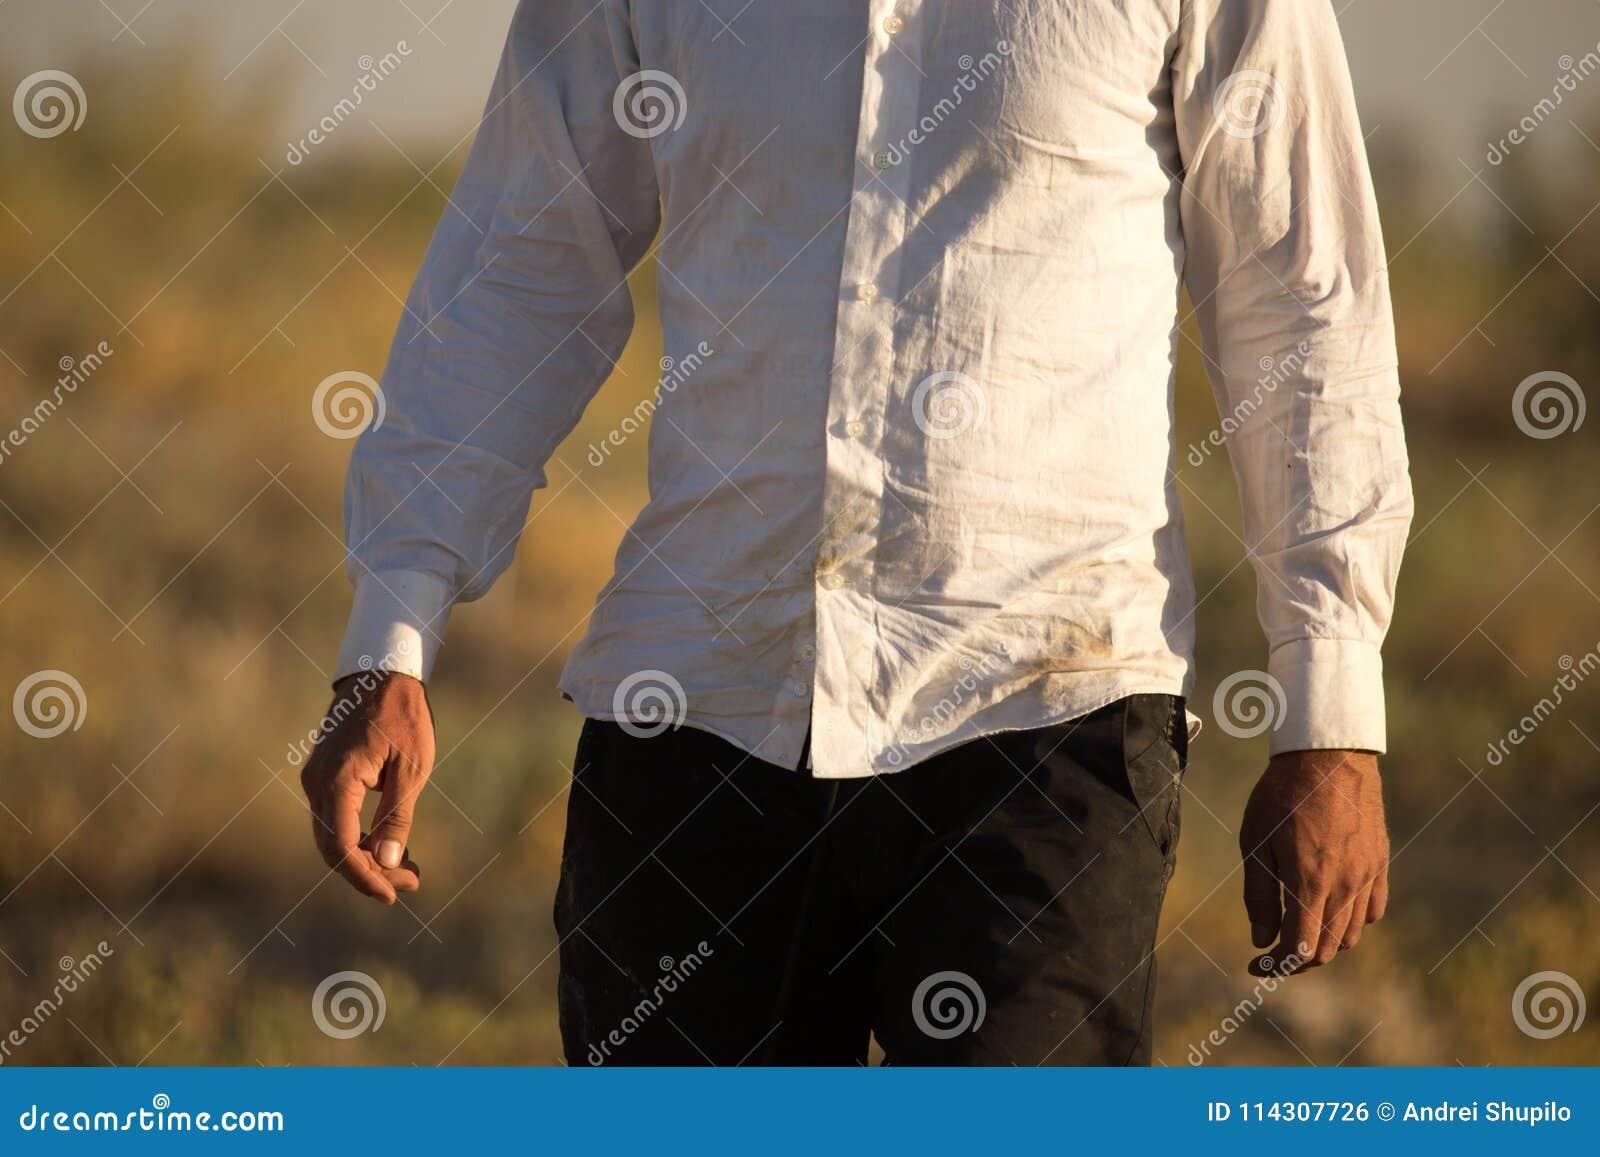 Camisa suja branca em um homem na natureza